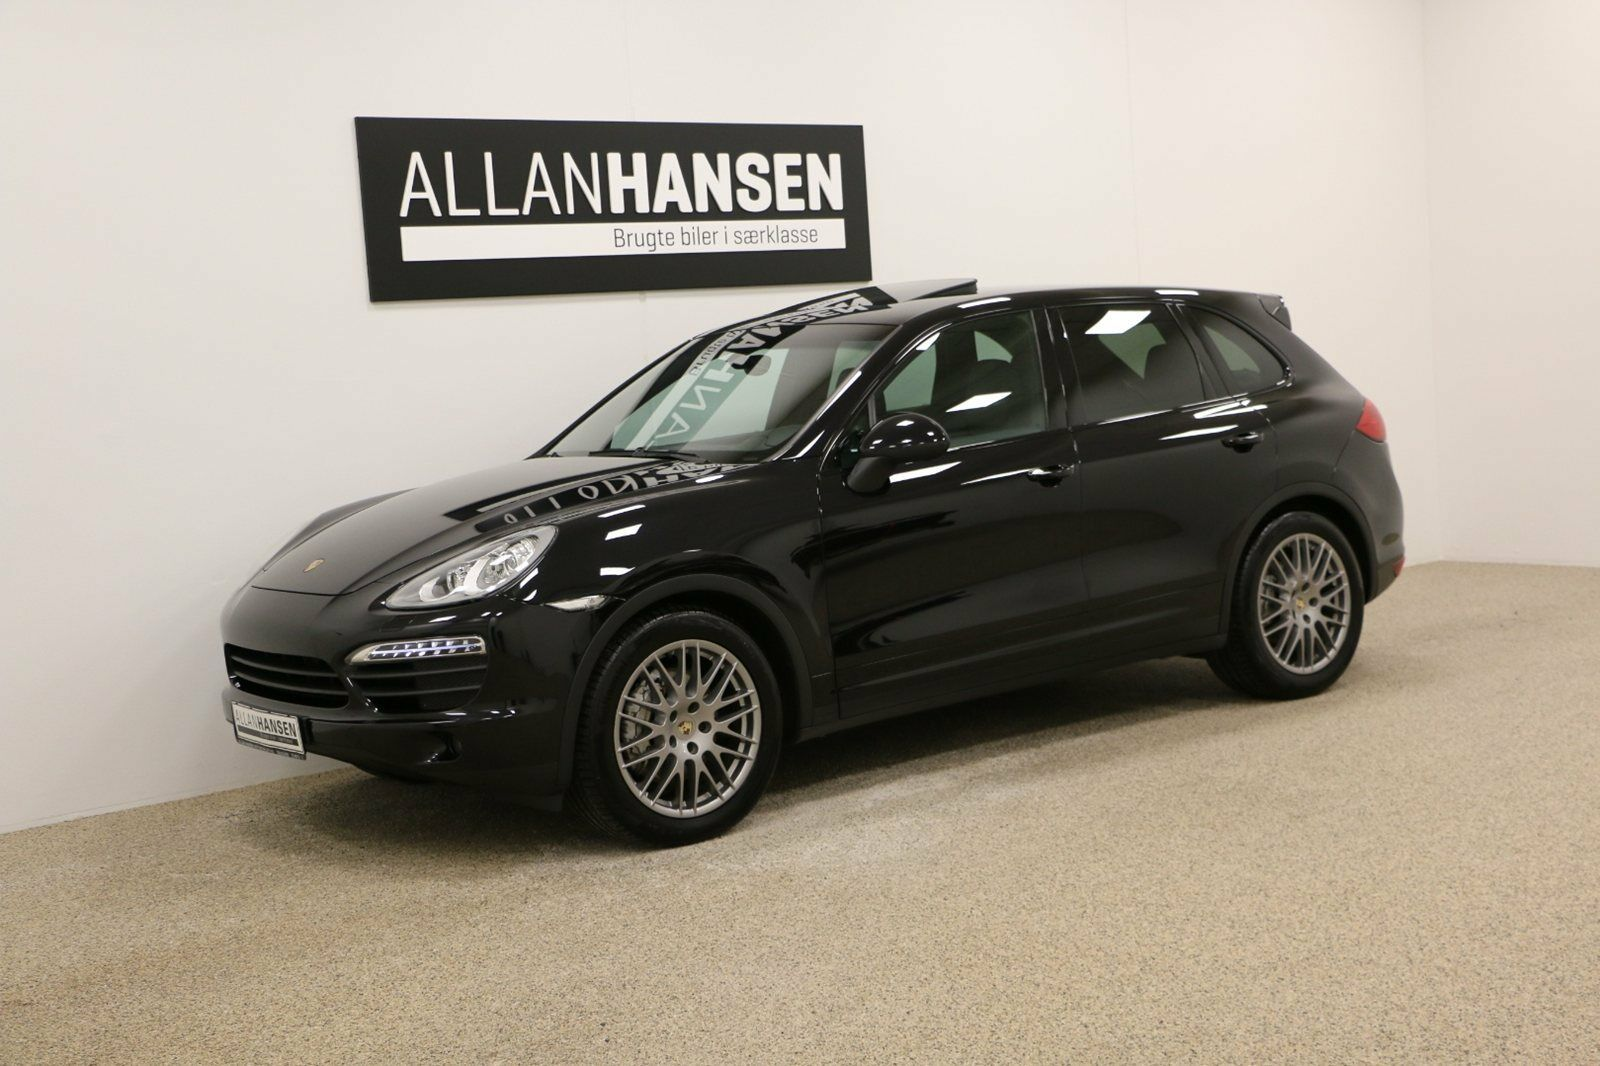 Porsche Cayenne S 4,8 Tiptr. 5d - 549.900 kr.